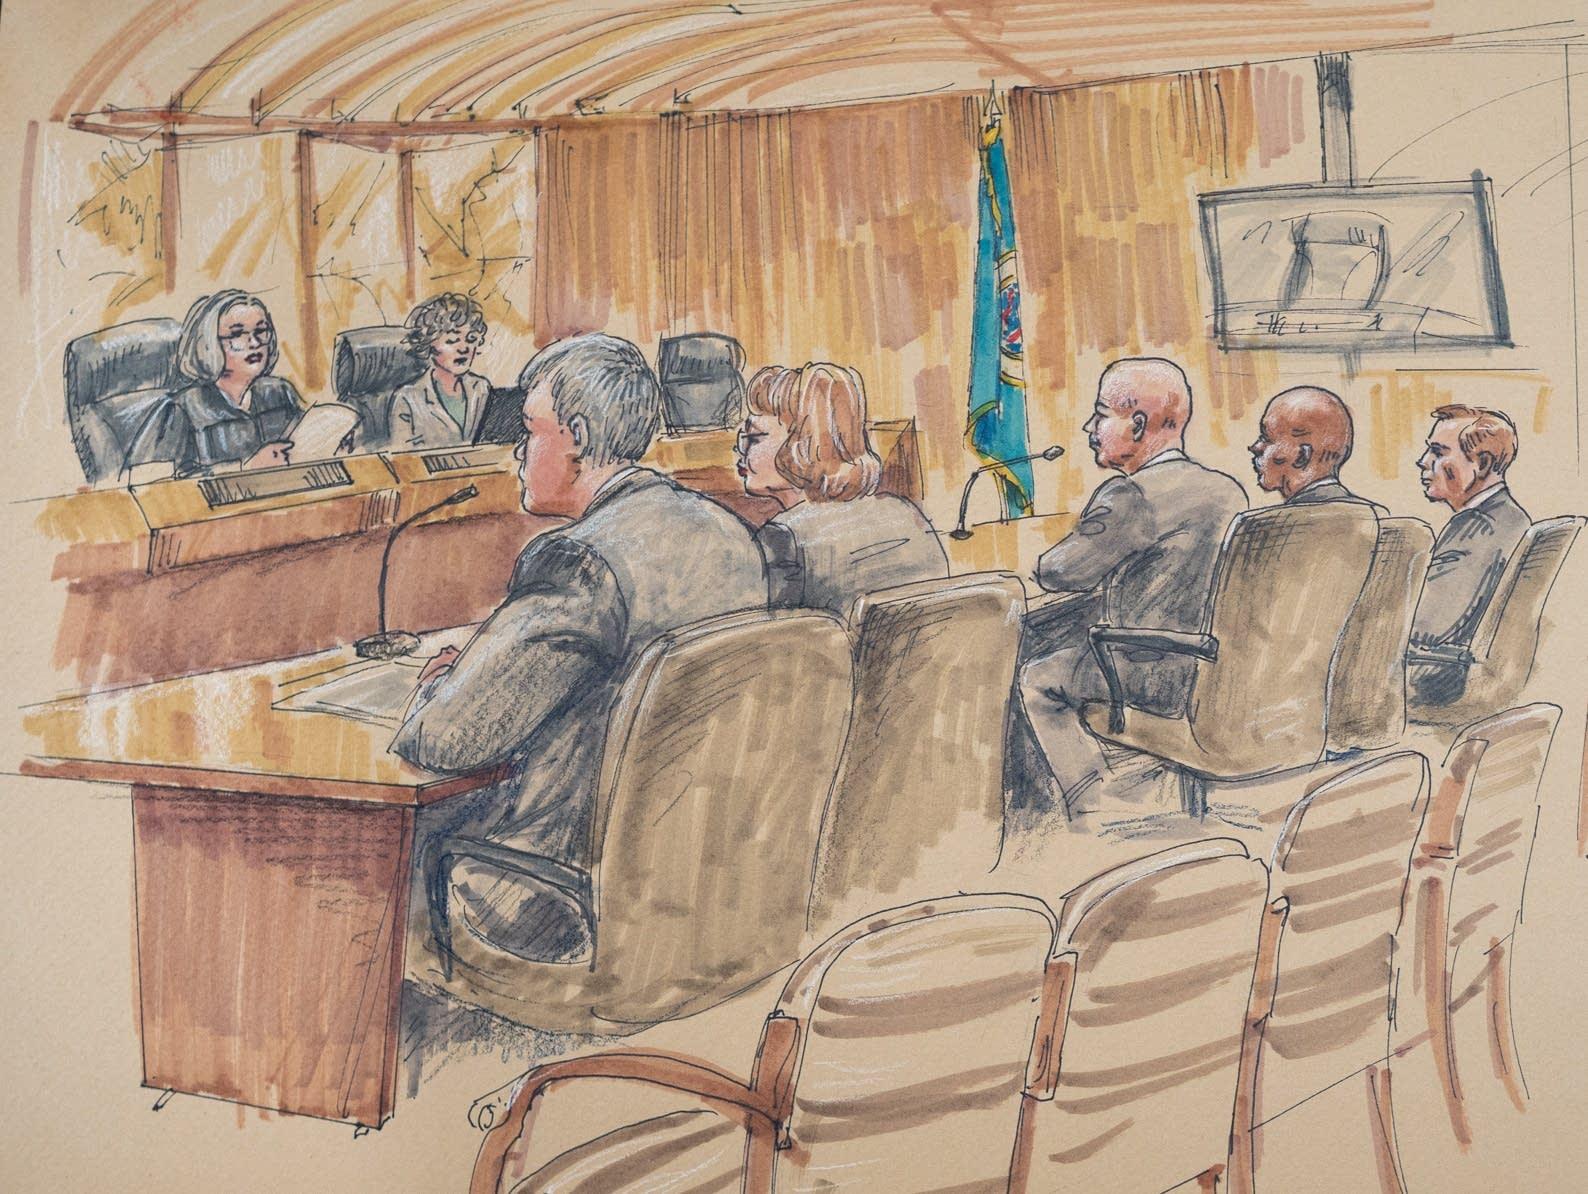 Inside the courtroom at Mohamed Noor's trial on Monday, April 1, 2019.